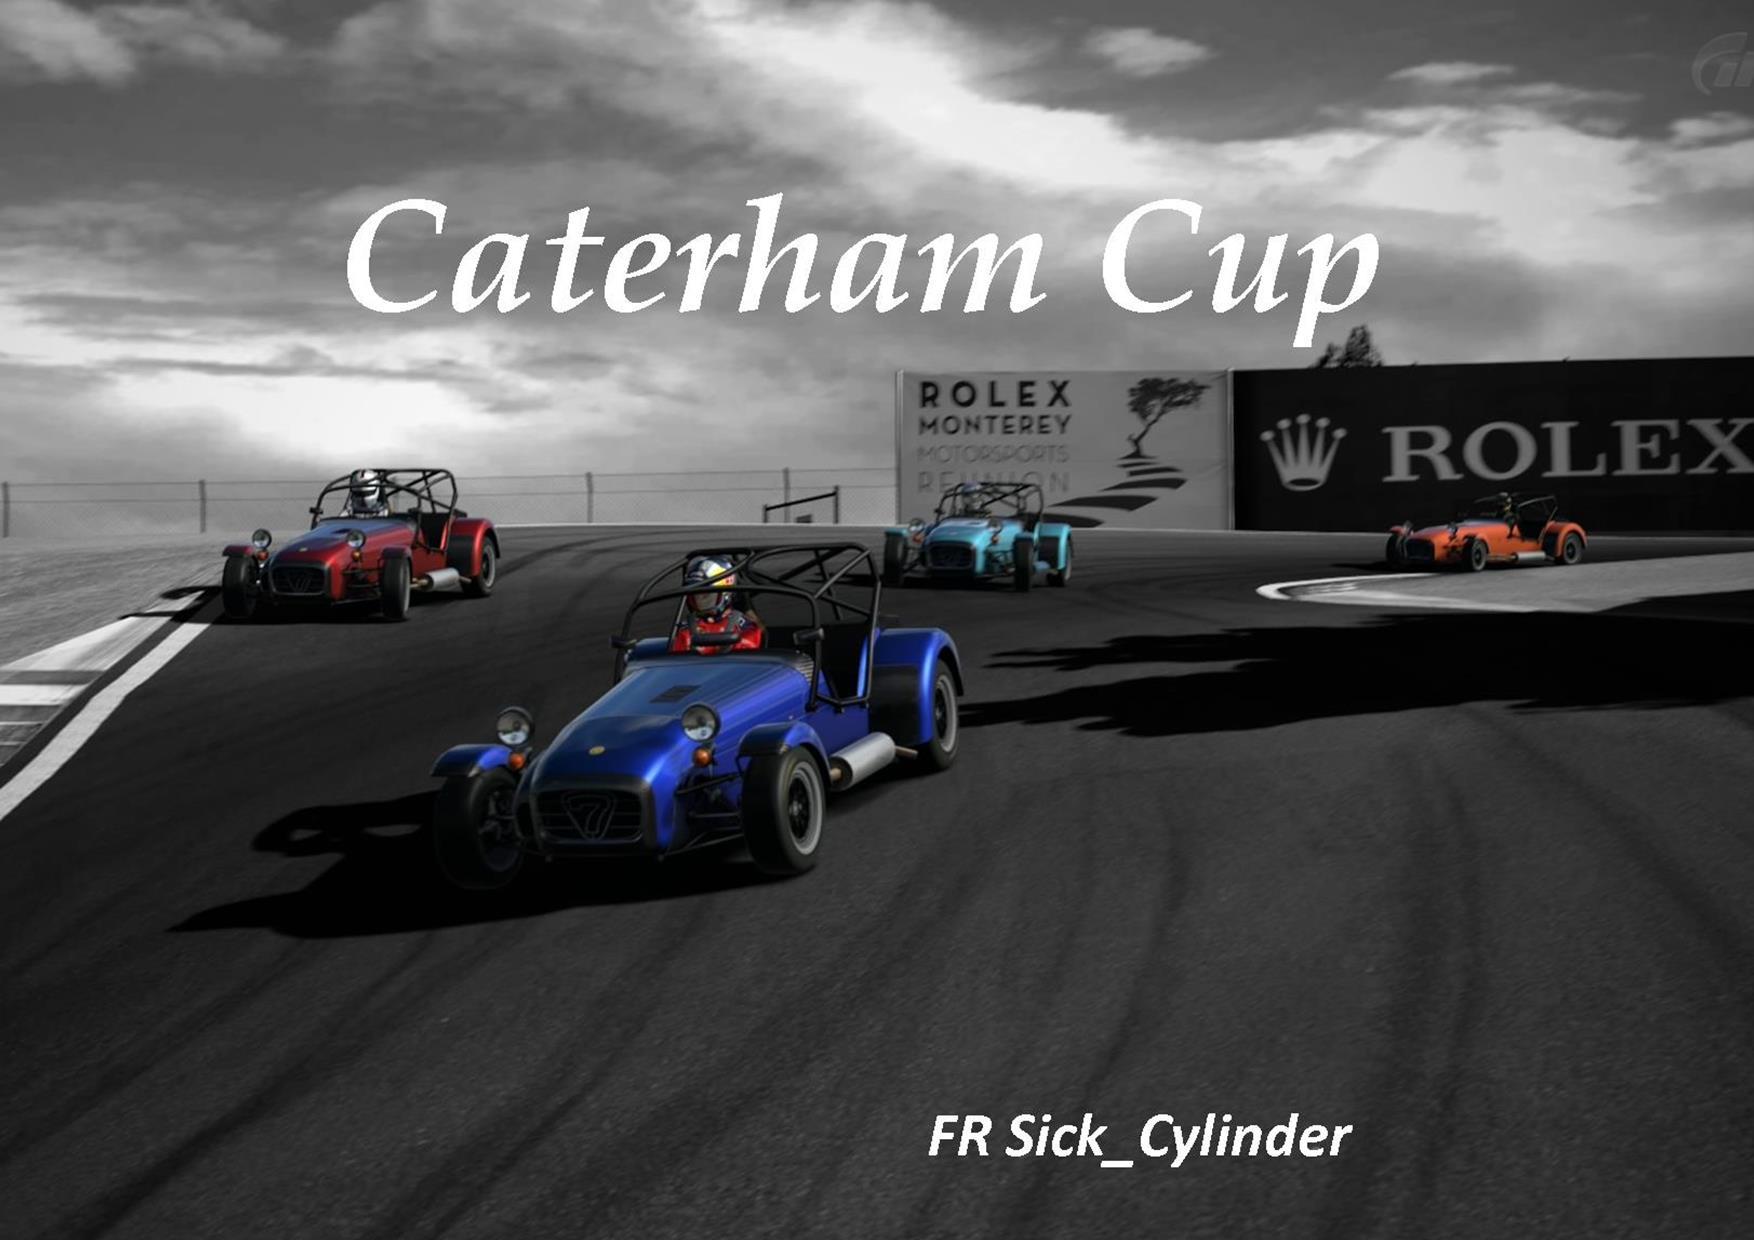 Caterham Cup Poster.jpg